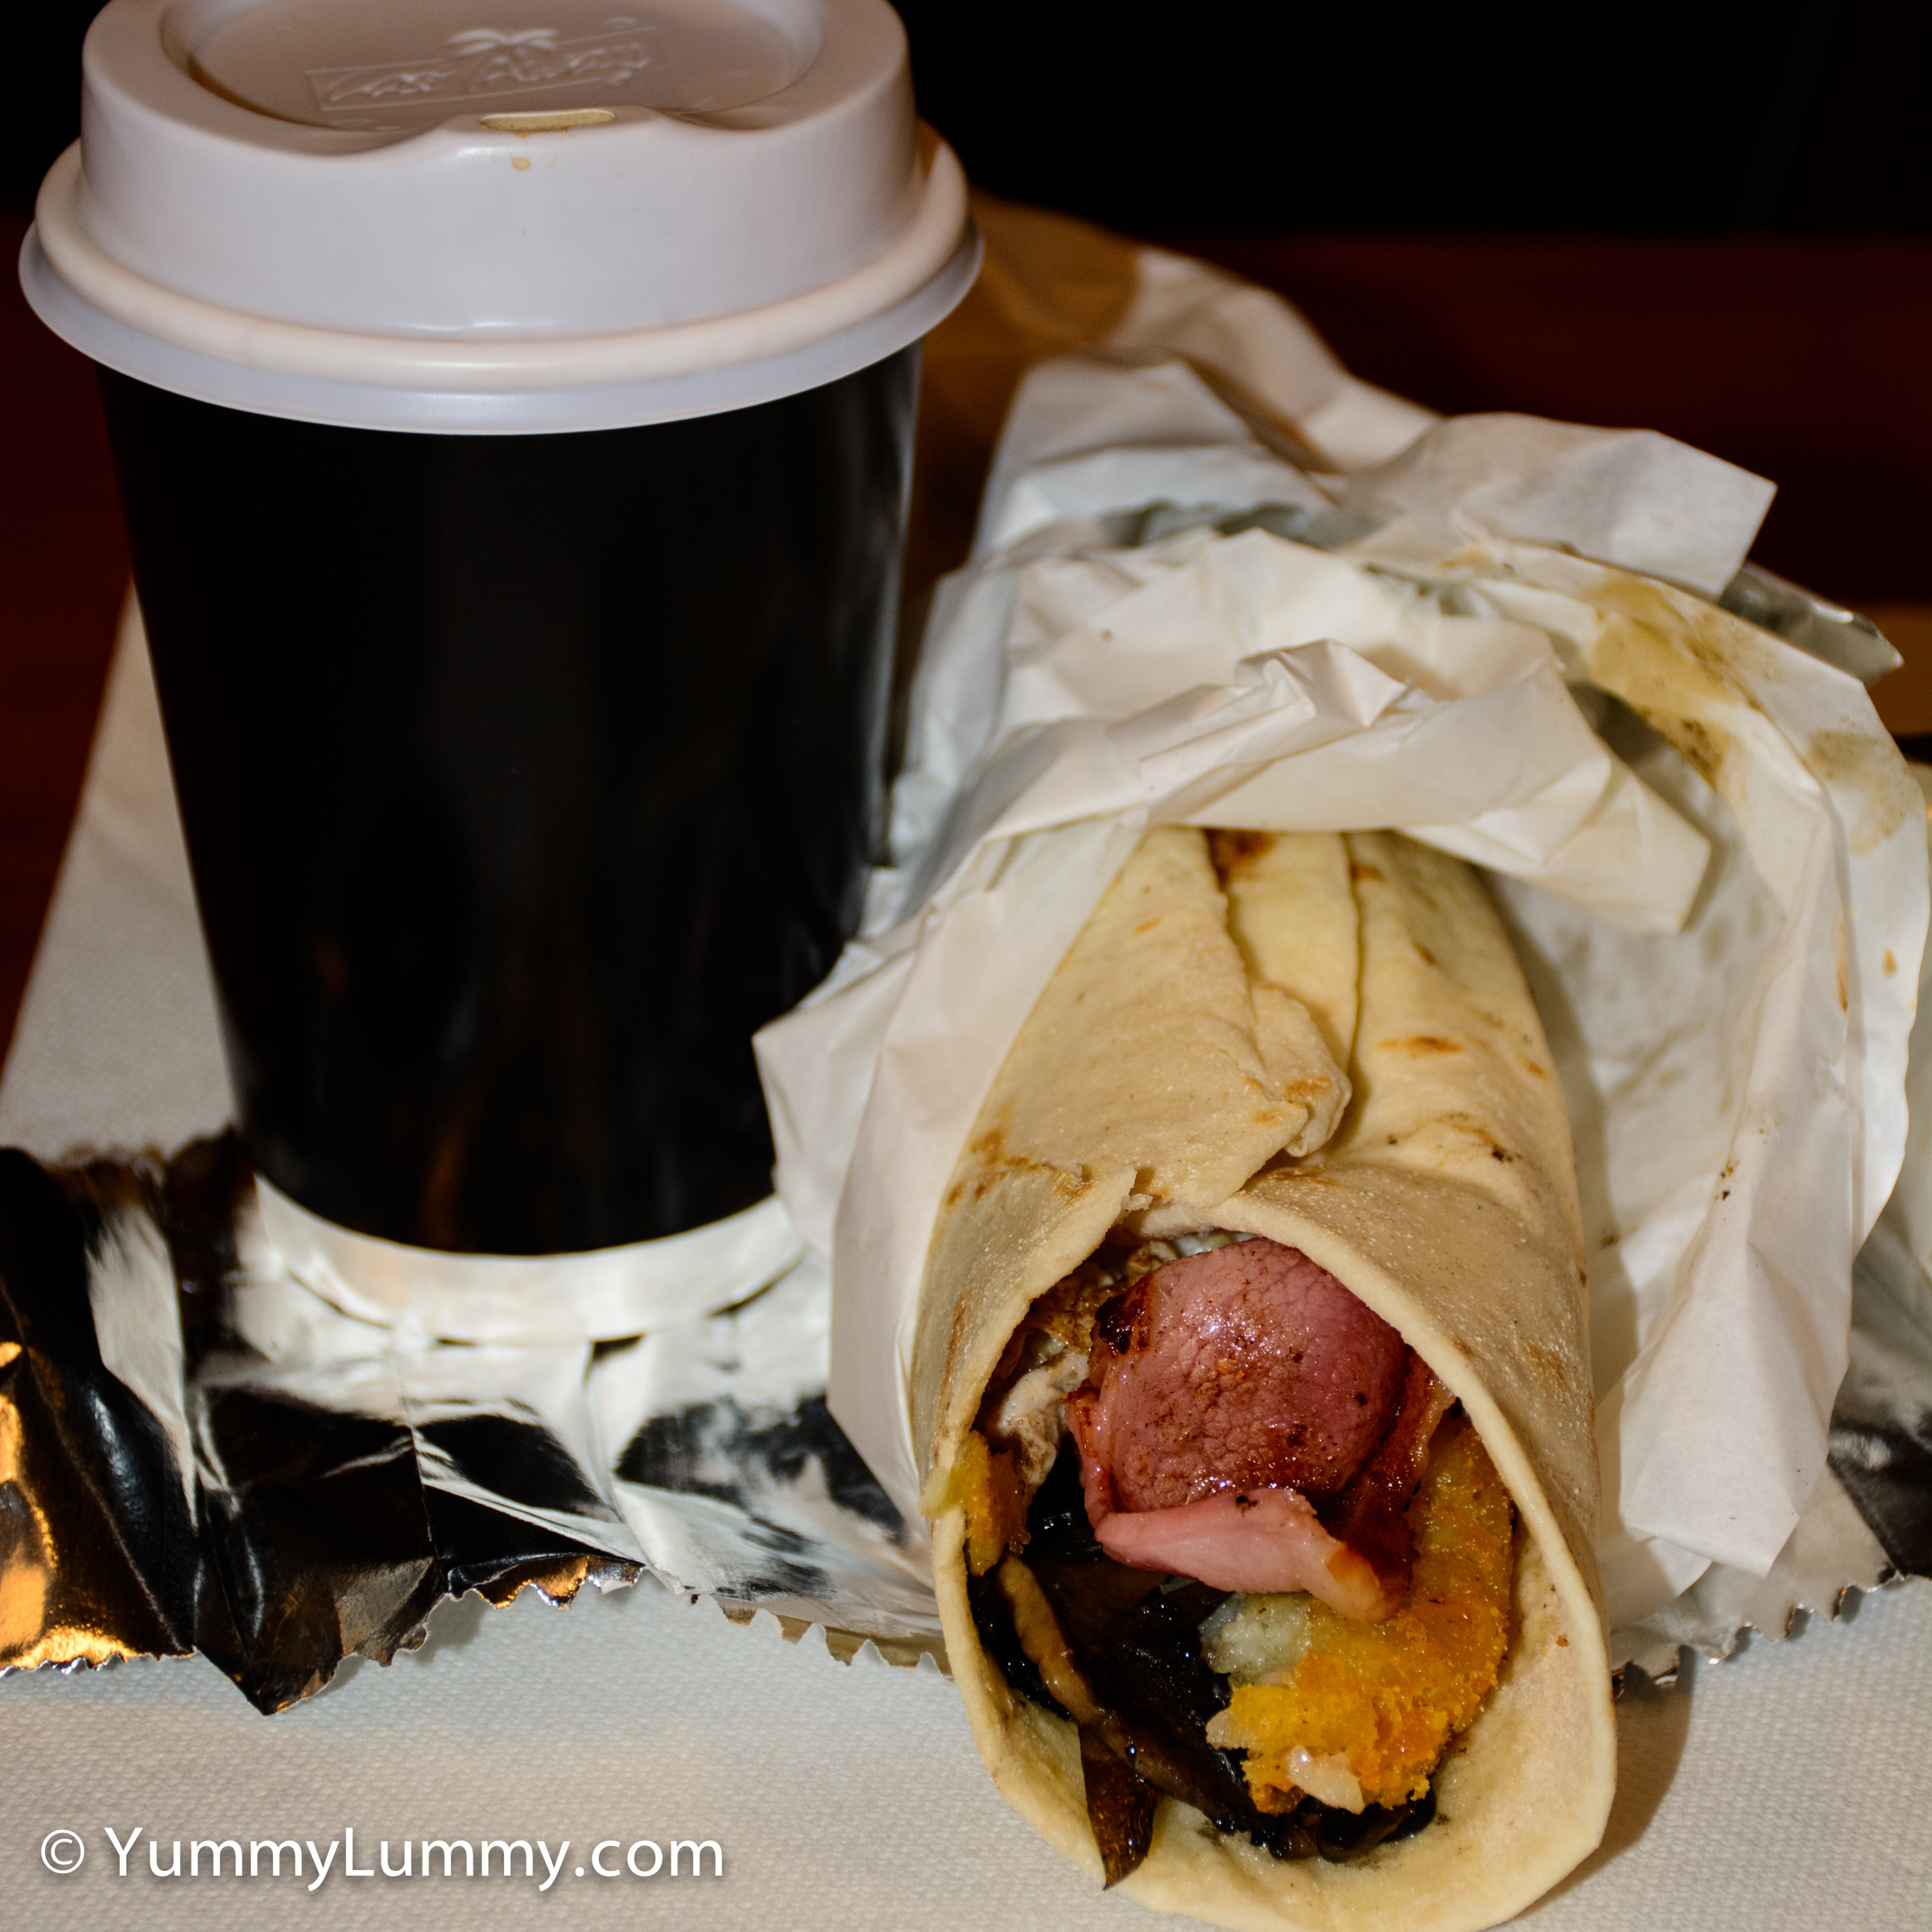 Happy hump day. Takeaway Mavi breakfast wrap and a regular flat white coffee.